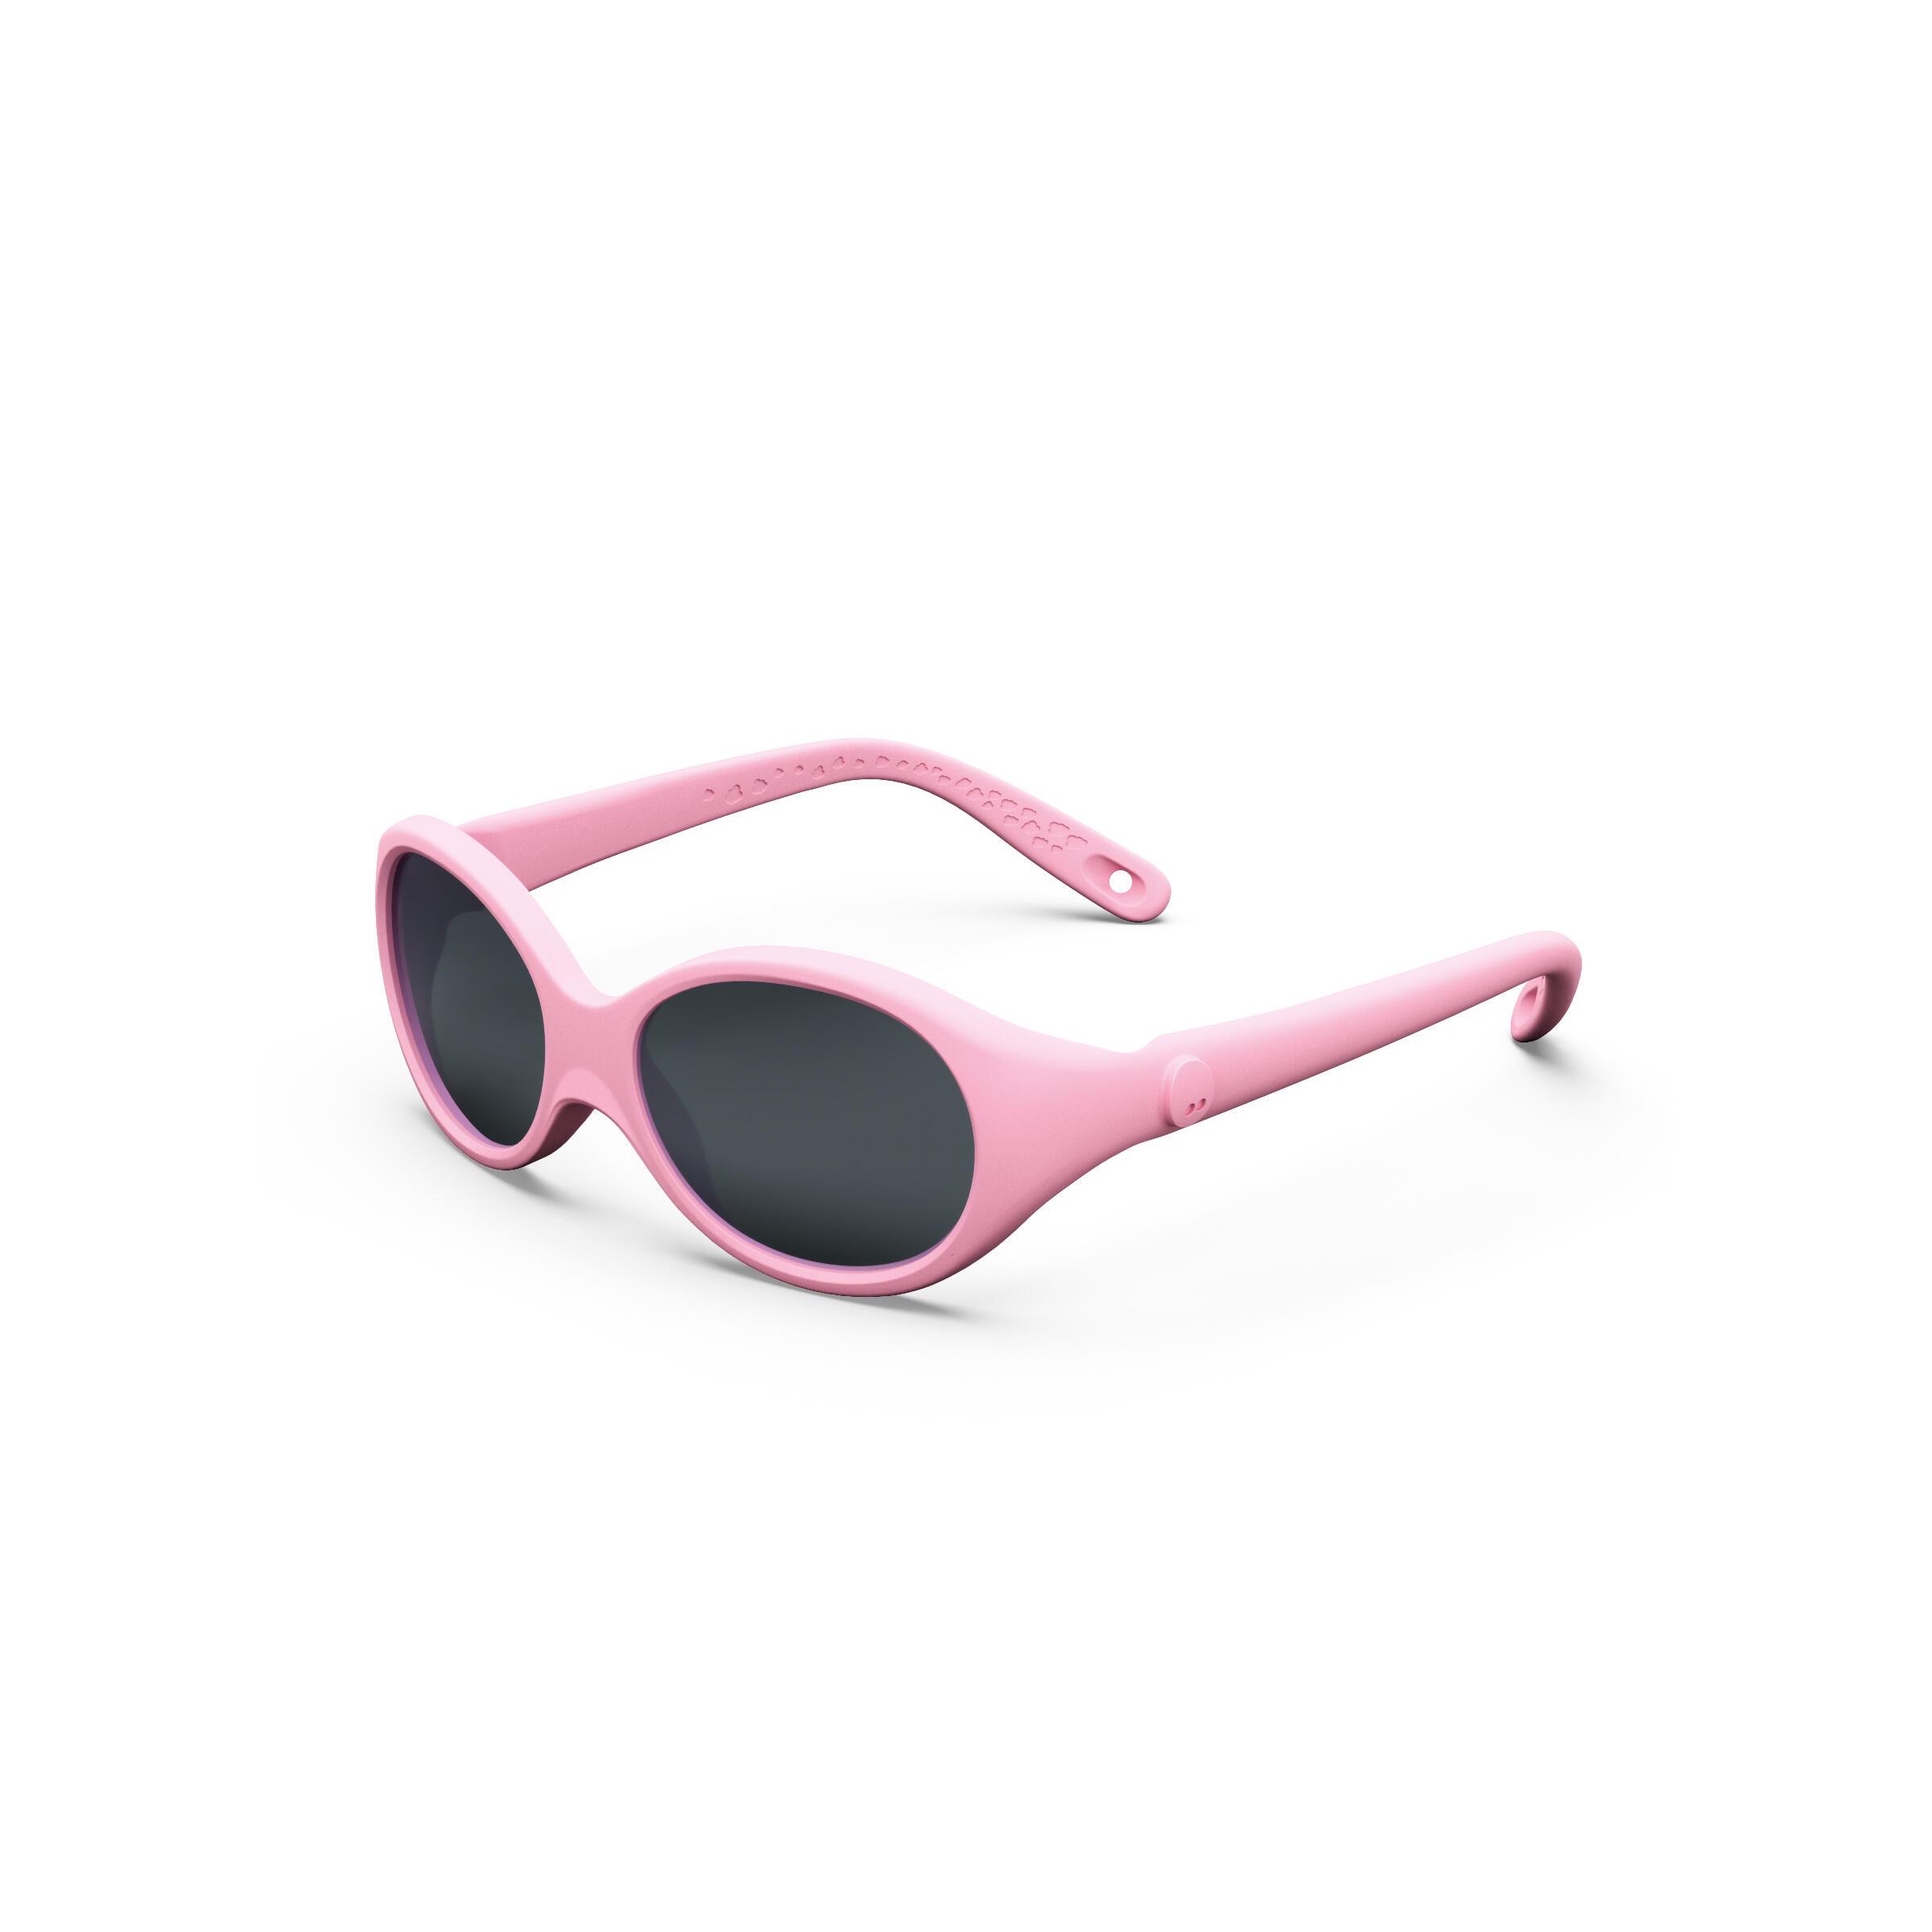 Ochelari soare MH B100 roz imagine